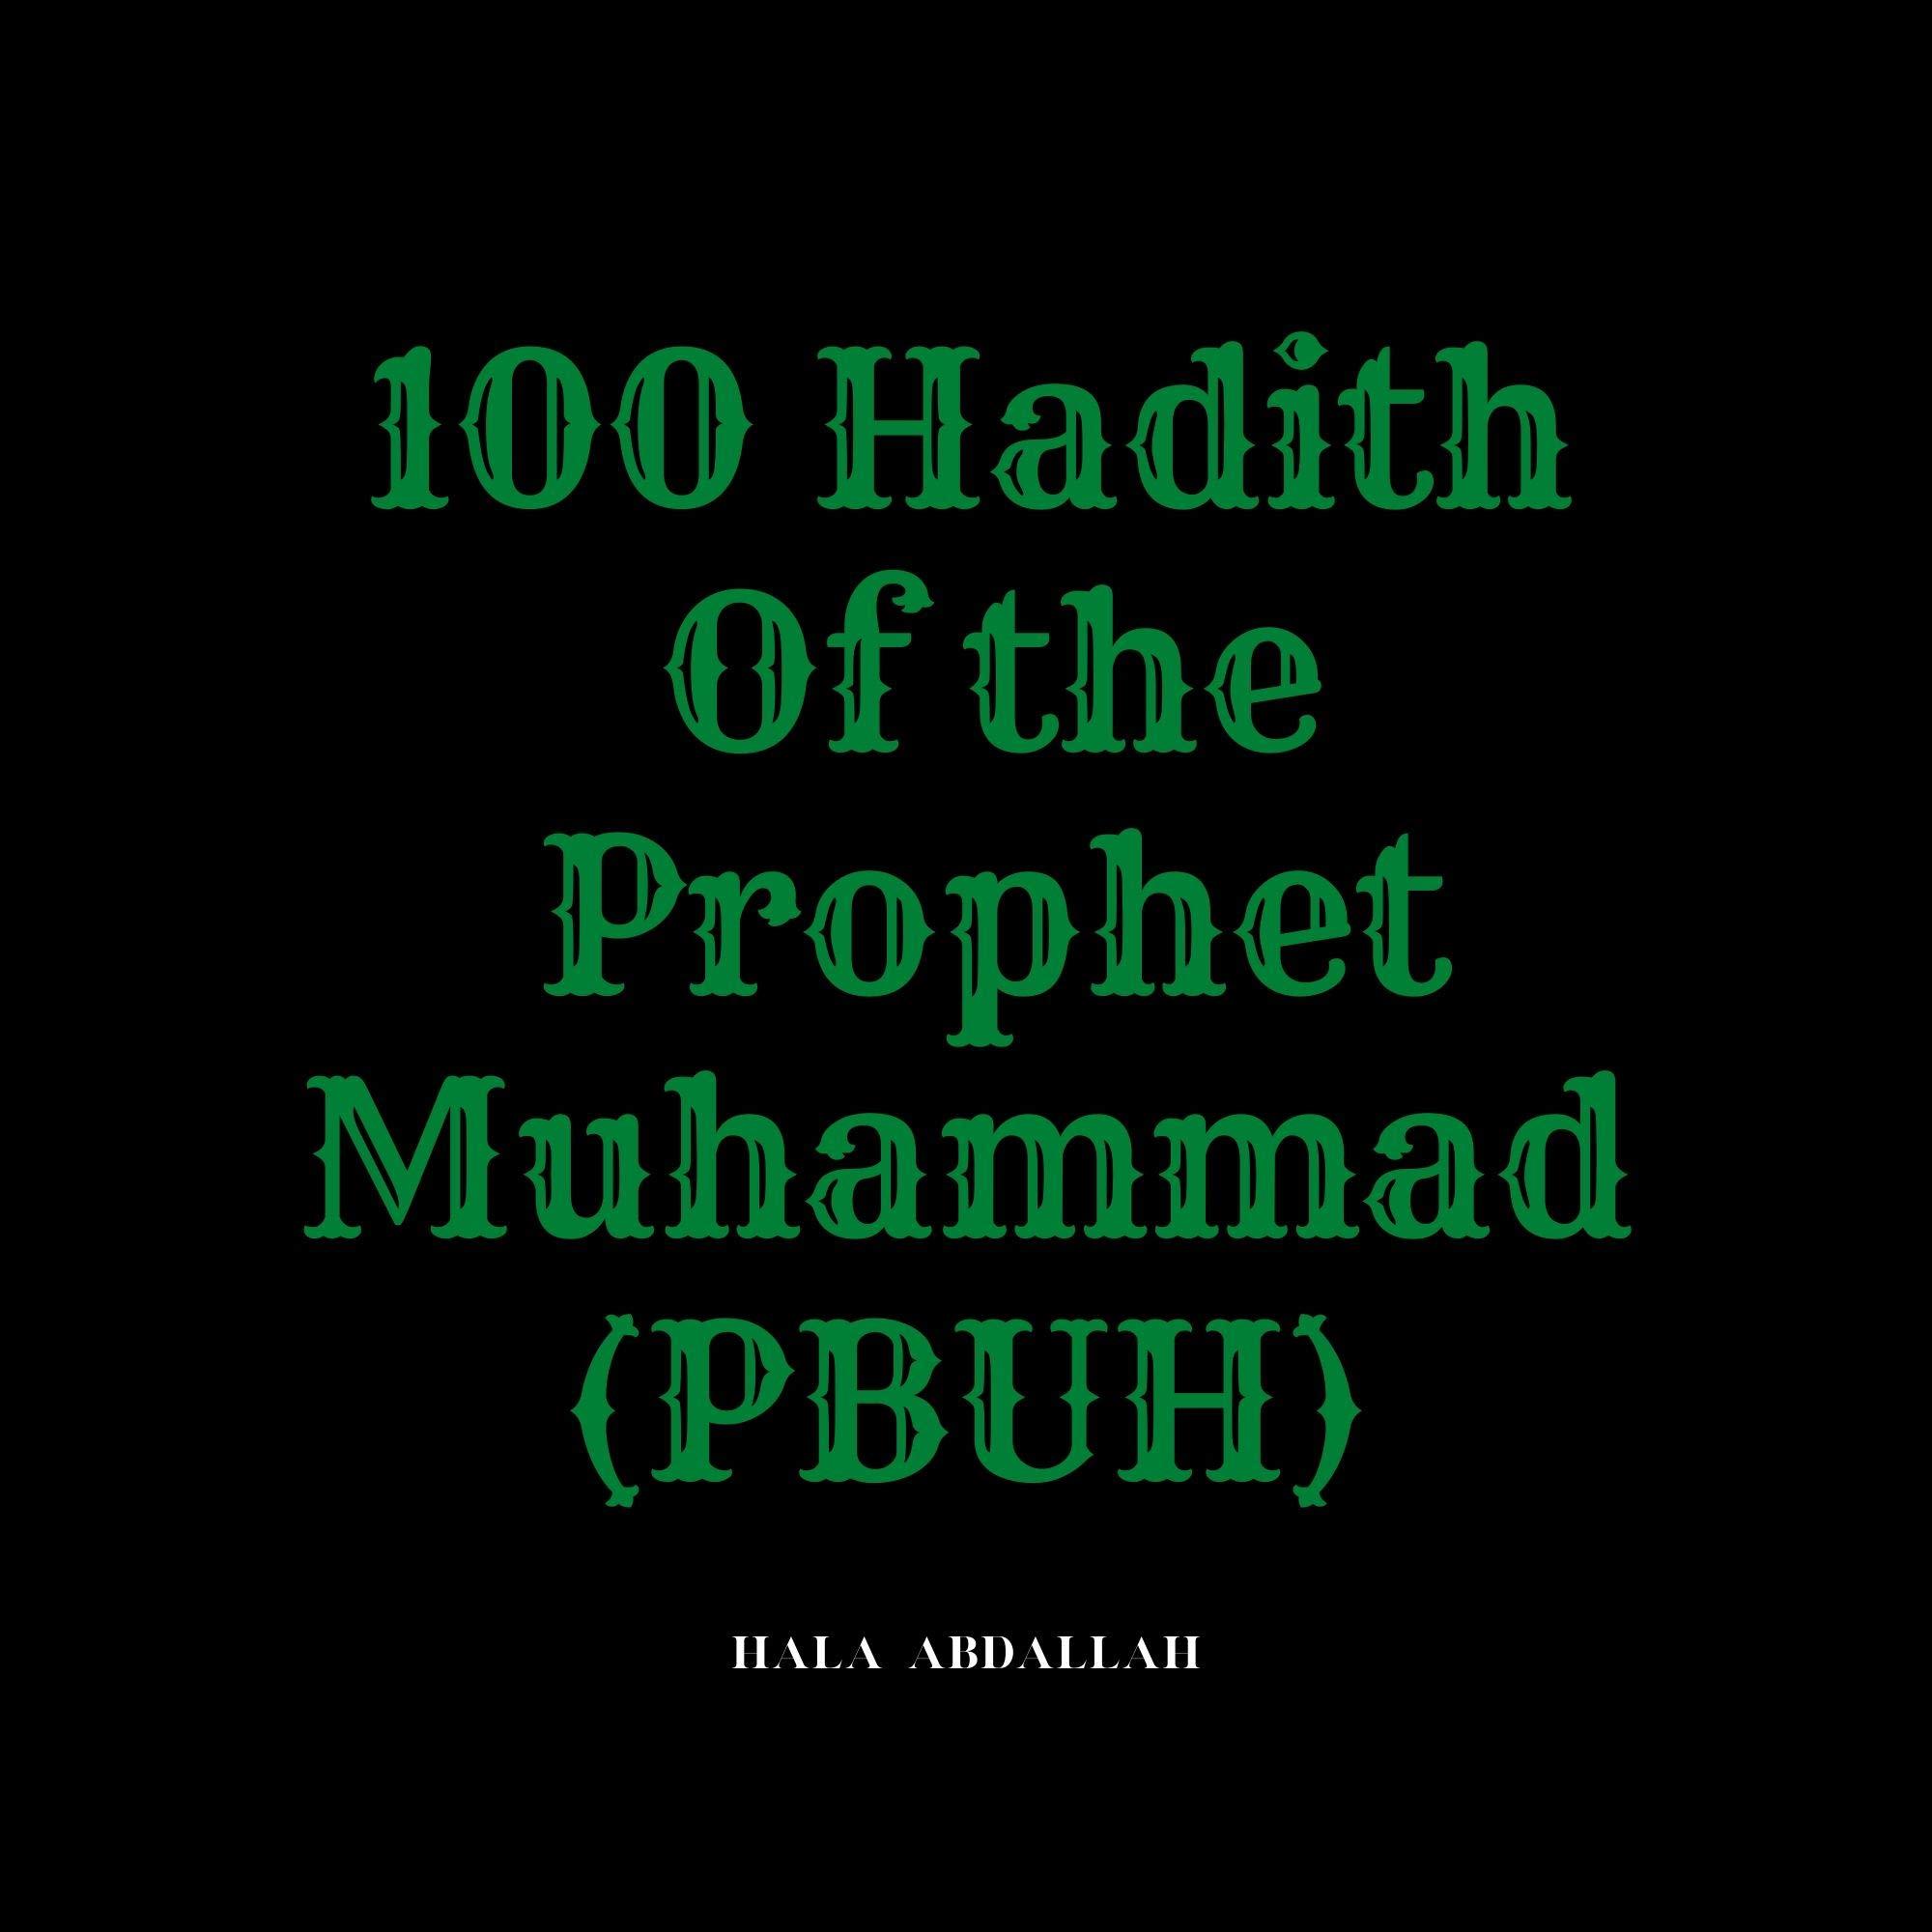 100 Hadith Of the Prophet Muhammad (PBUH): MOHAMMED THE PROPHET